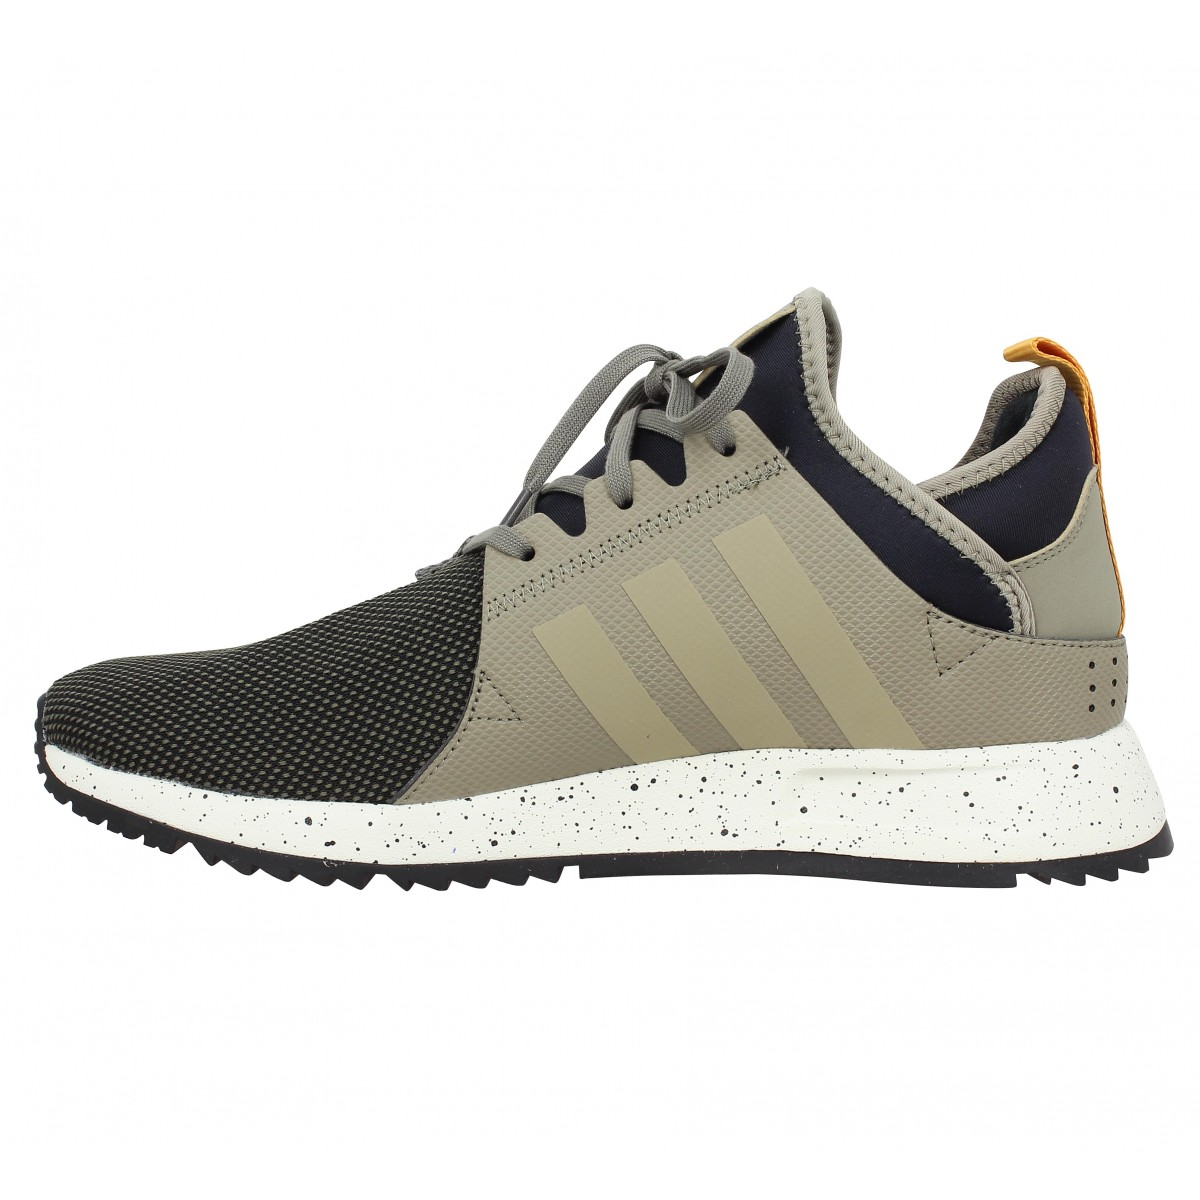 ADIDAS X PLR Sneaker Boot toile Homme Carton